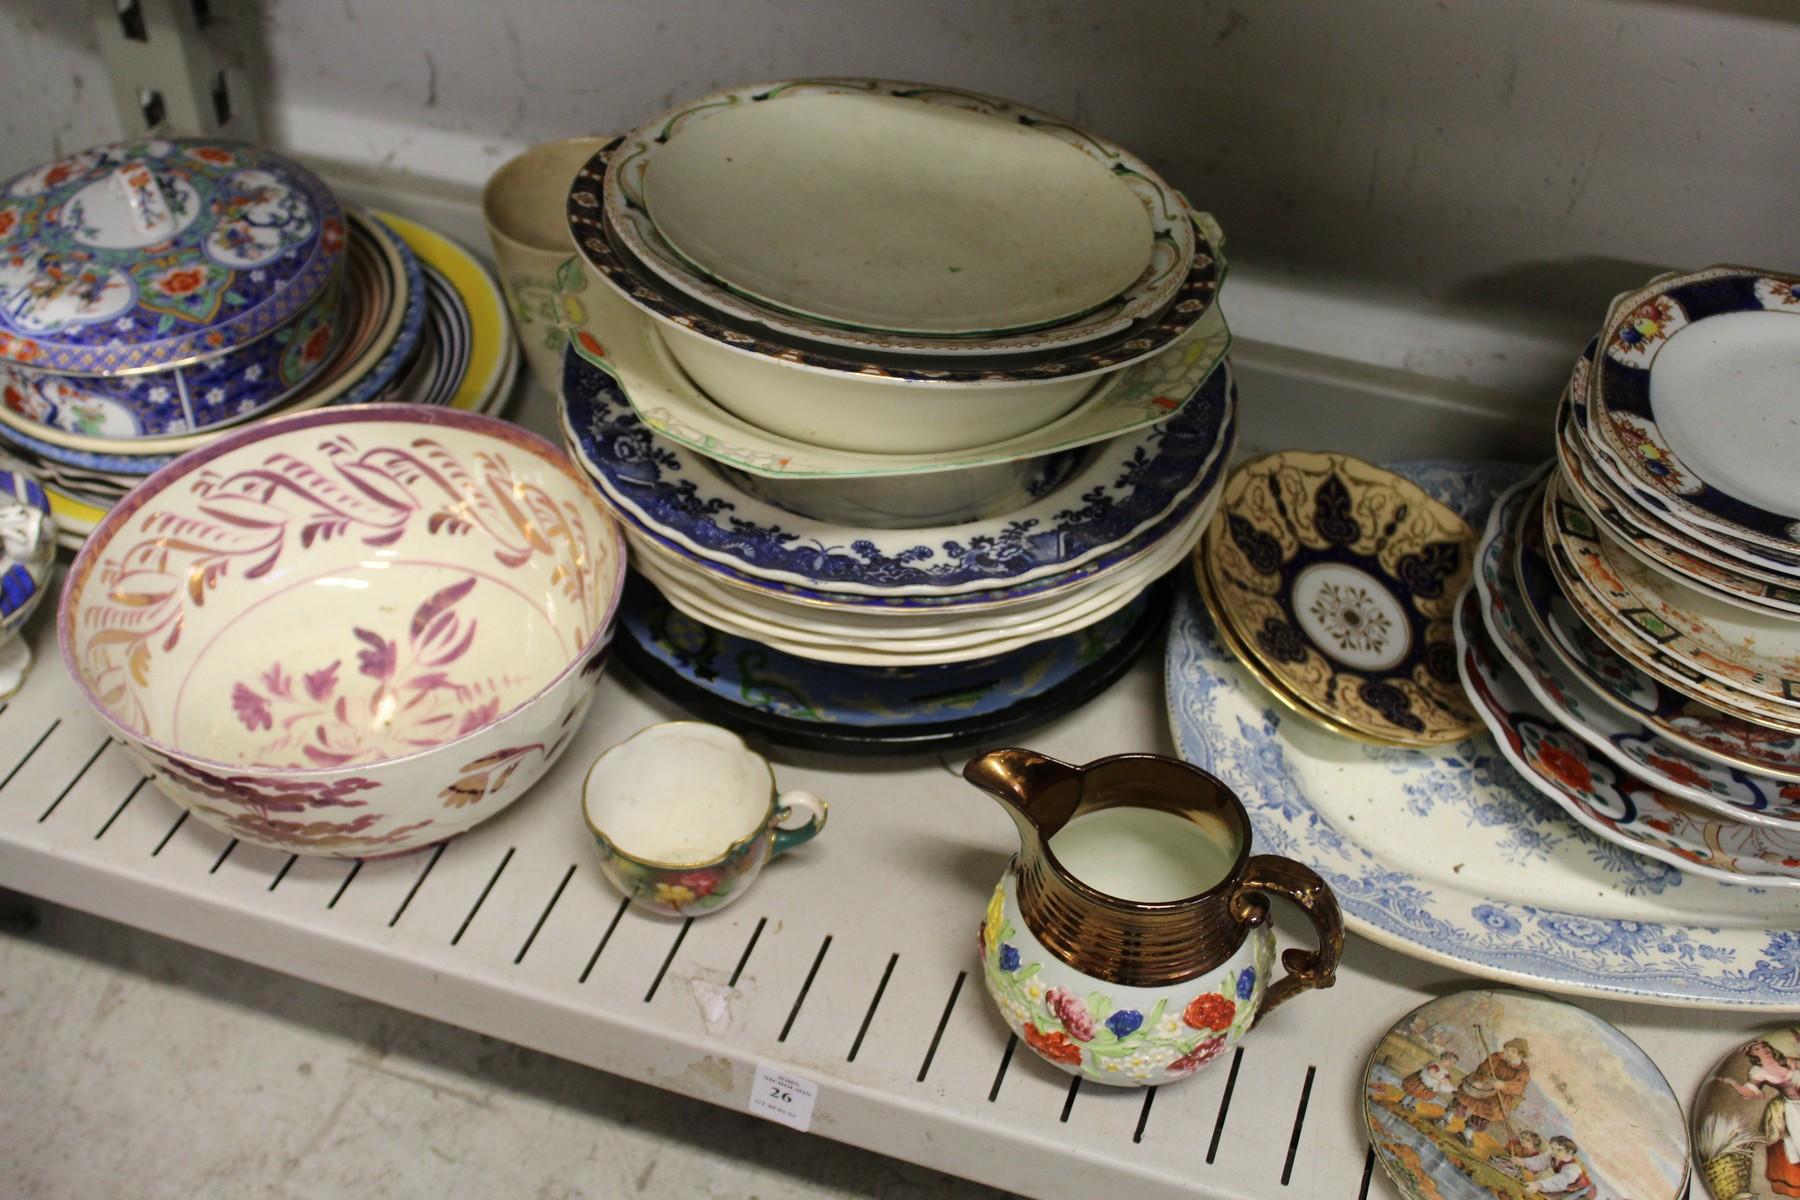 A shelf of decorative china.